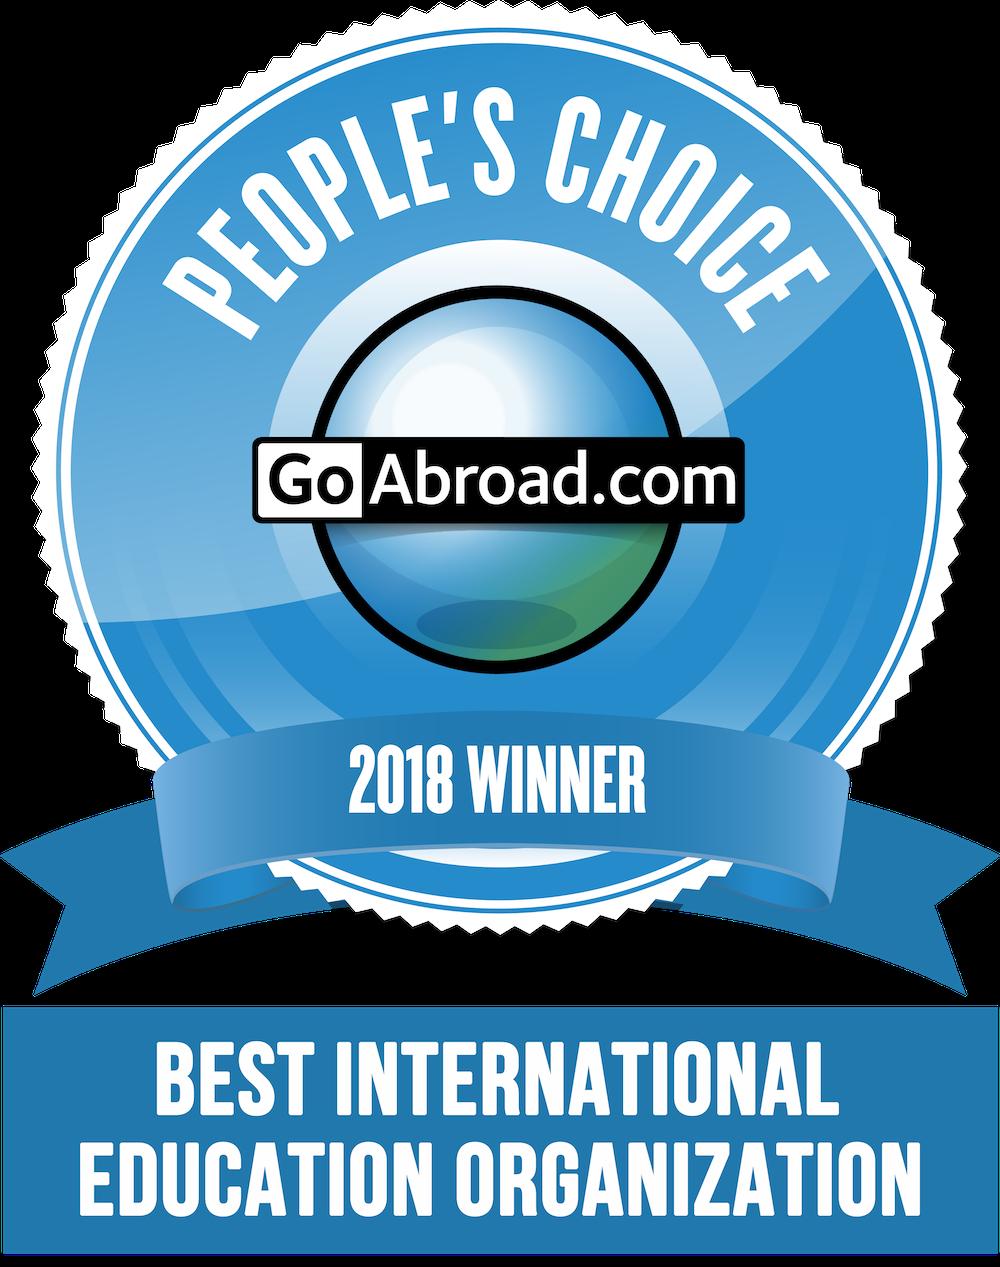 Best International Educational Organization